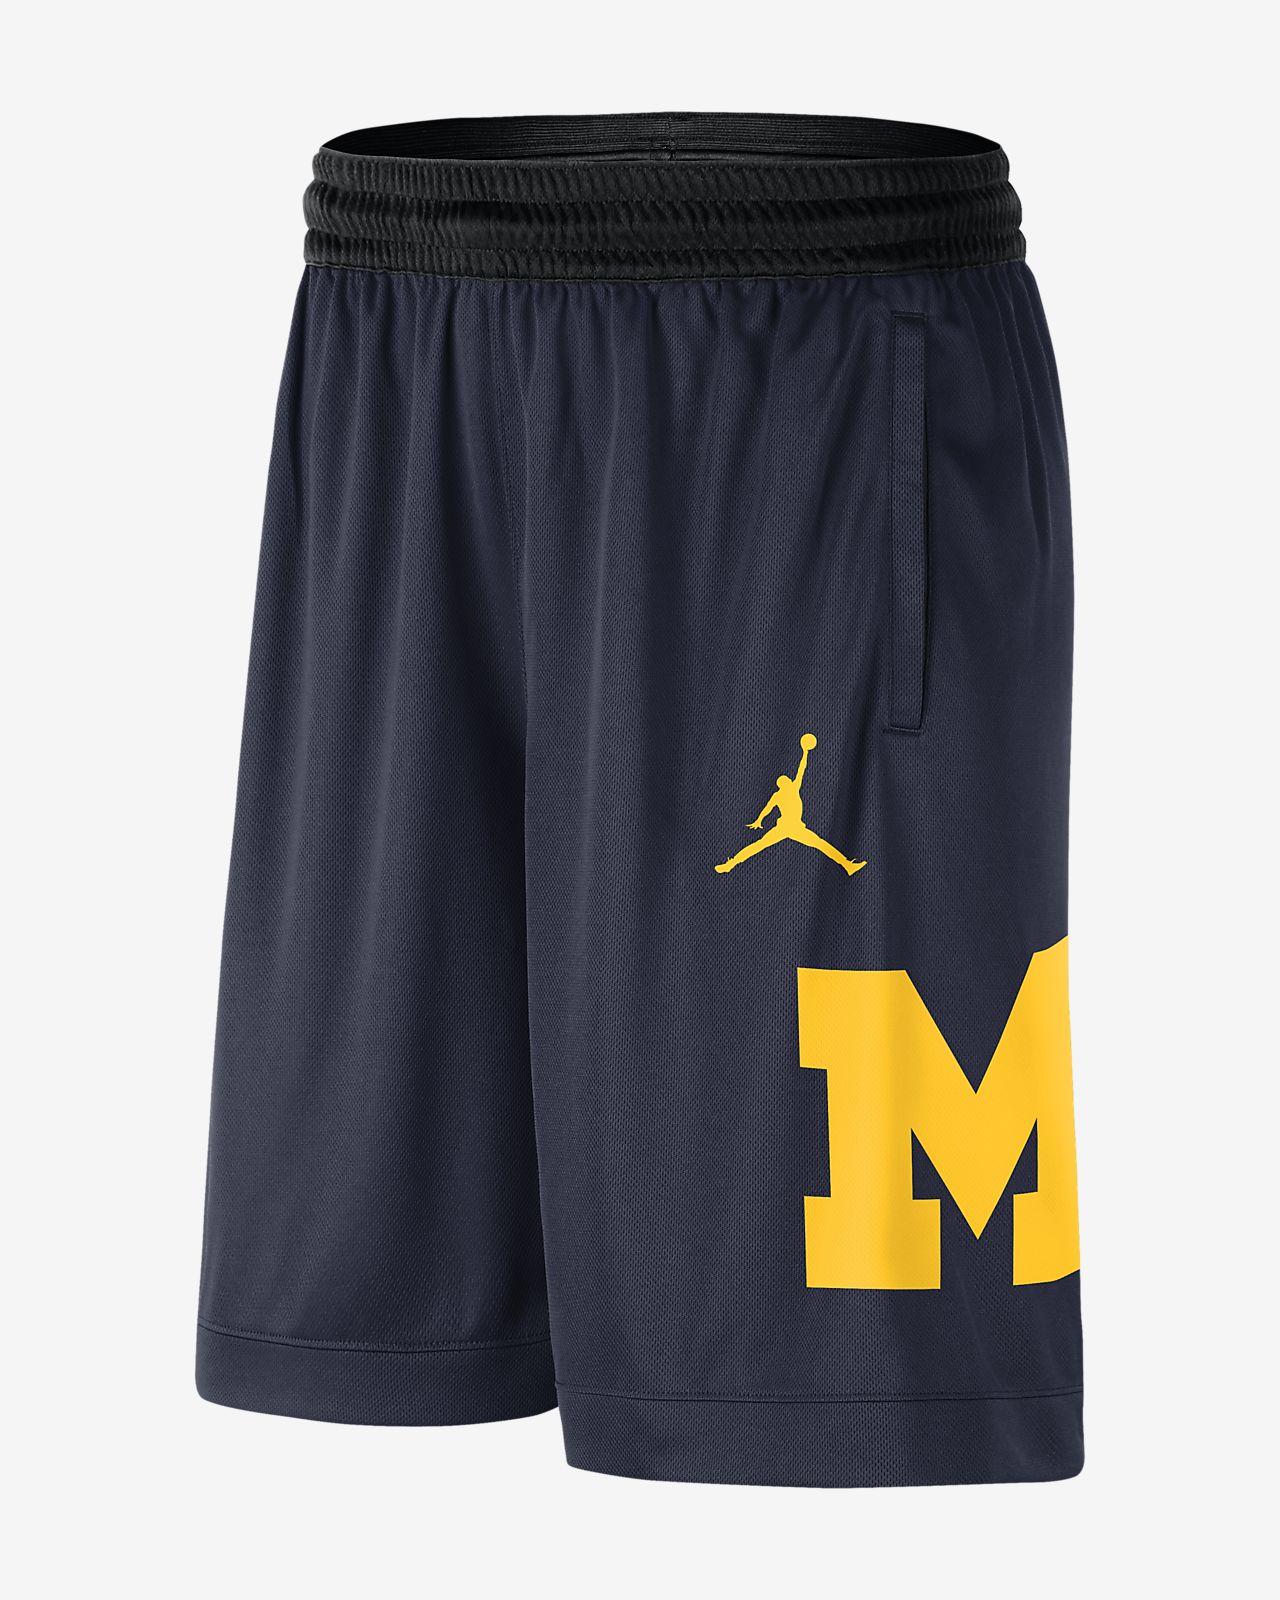 Jordan College Dri-FIT (Michigan) Men's Basketball Shorts